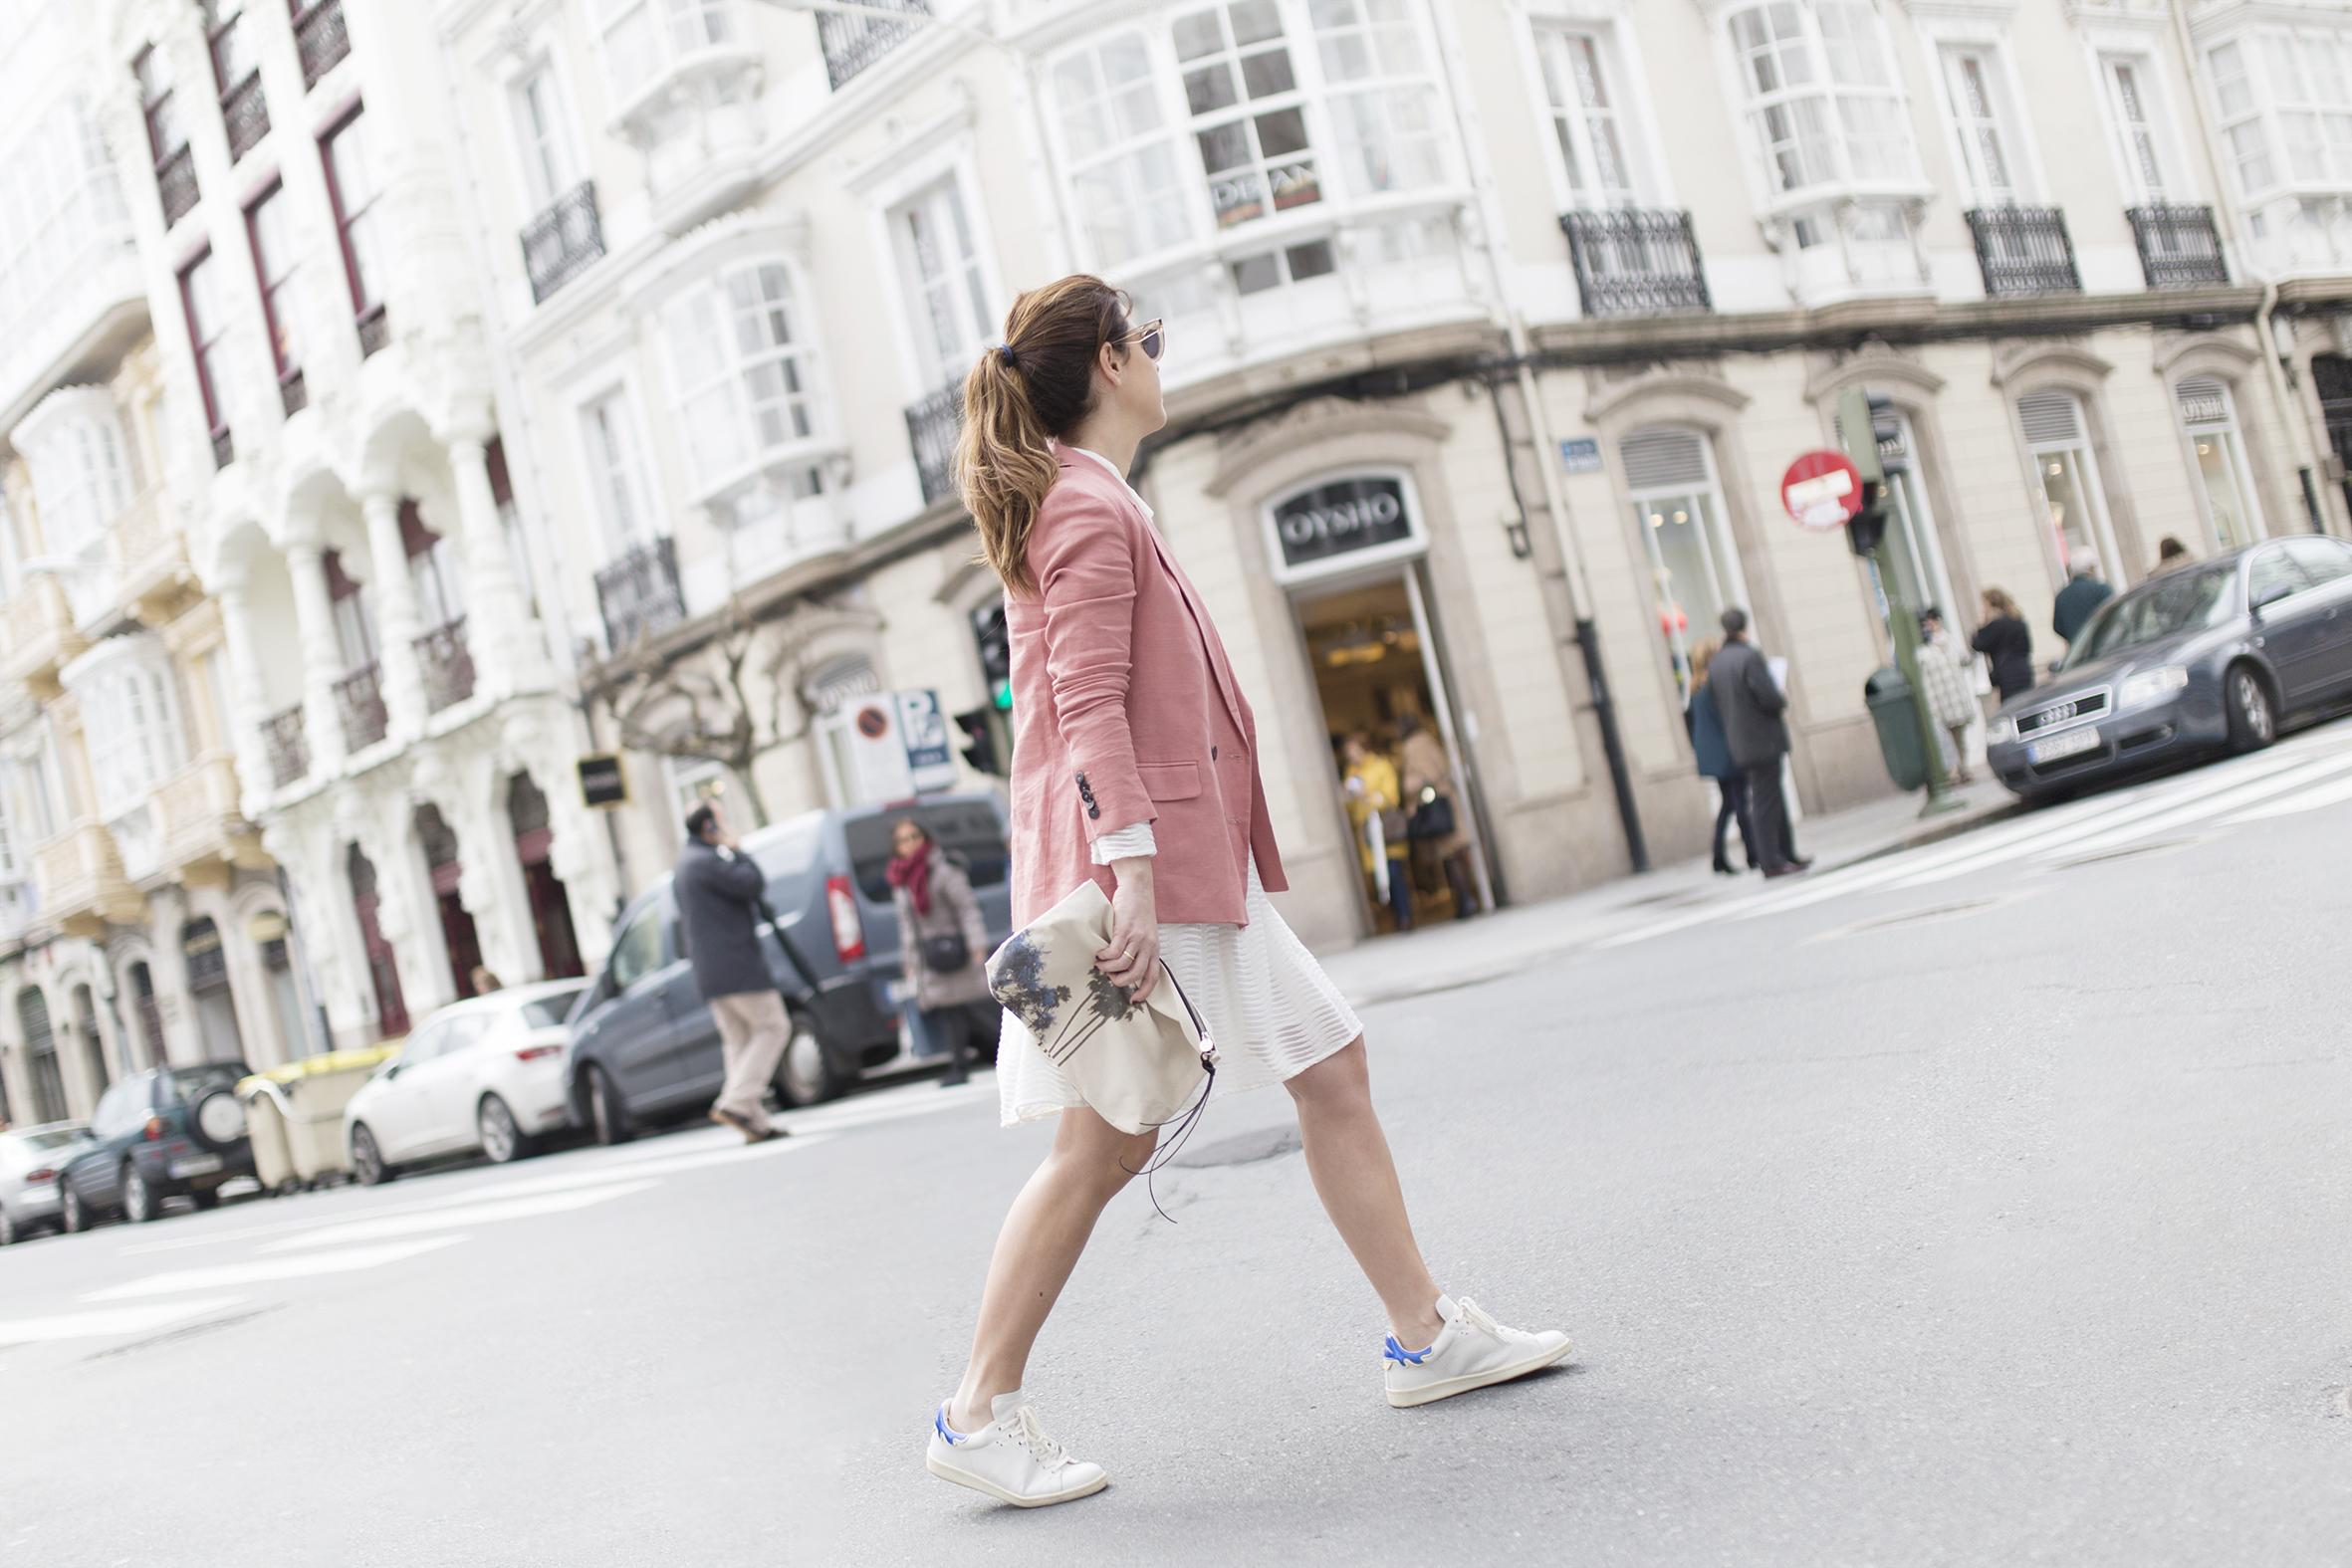 moda-calle-Coruña-Mango blazer -cèline sunglasses-fashion-Voglia-streetstye-descalzaporelparque-Silver Lake Zubi-Isabel Marant sneakers